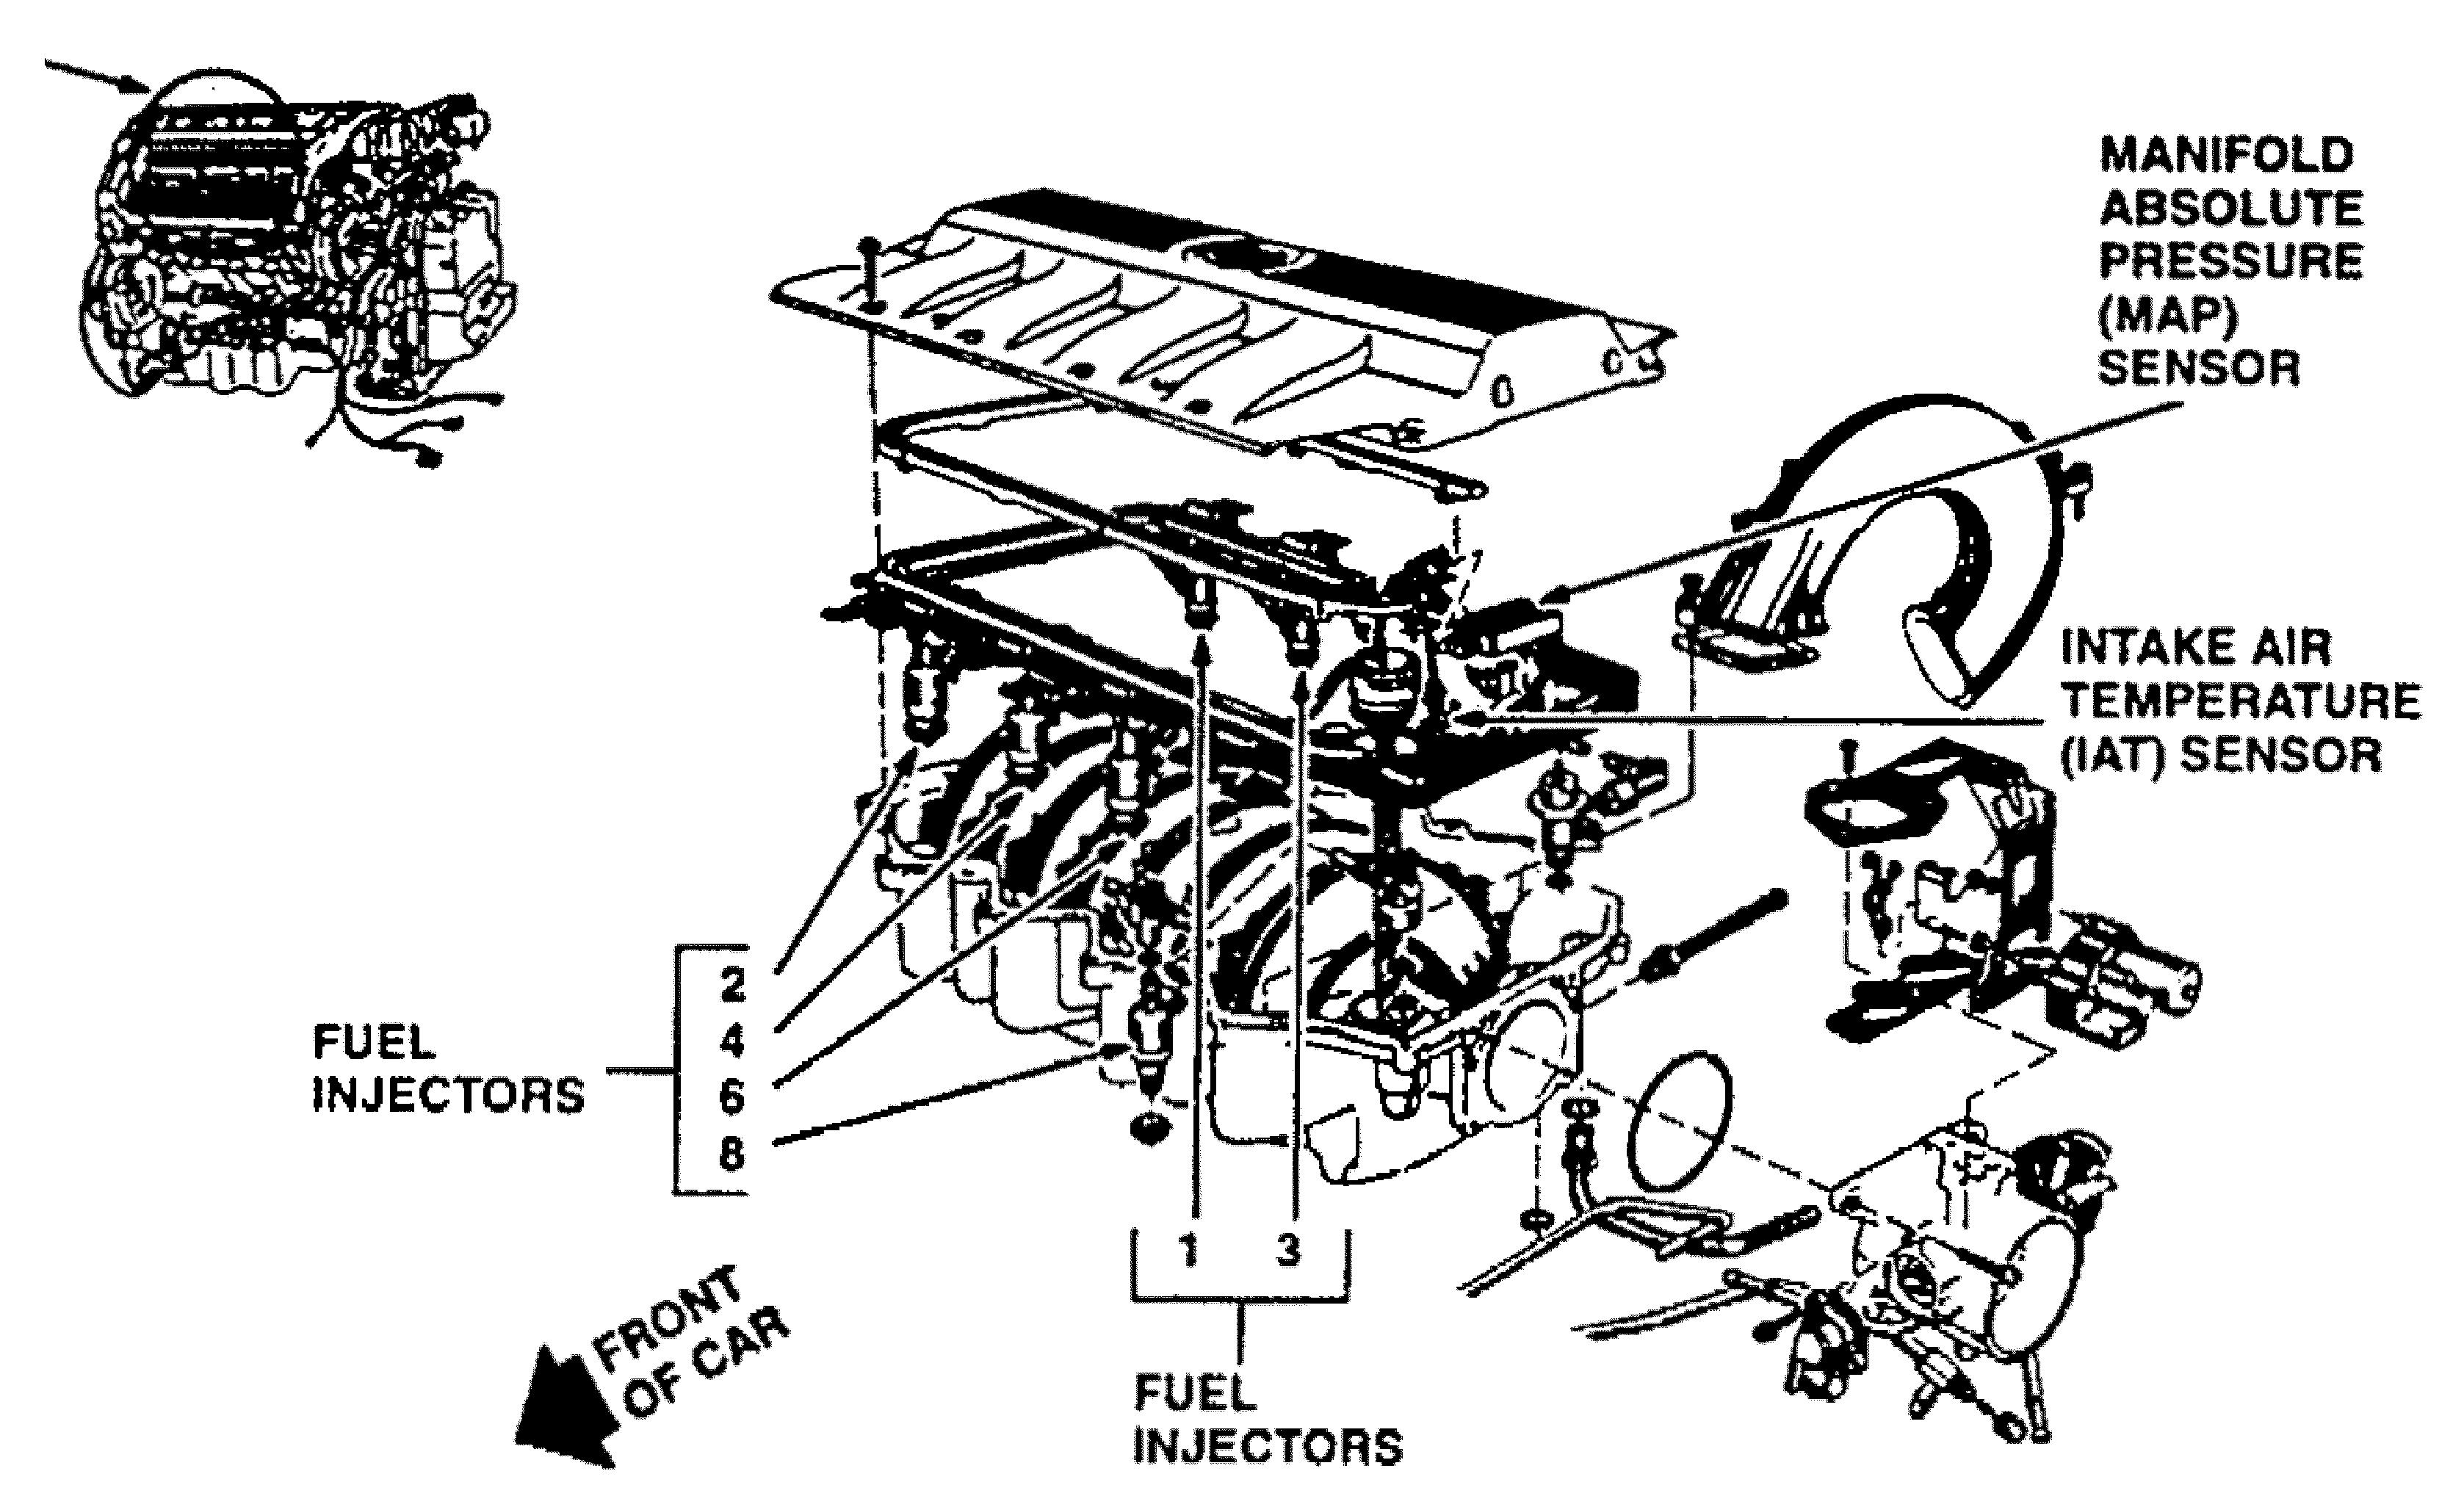 2007 Escalade Engine Diagram - Mobile Home Coleman Furnace Wiring -  stereoa.yenpancane.jeanjaures37.frWiring Diagram Resource